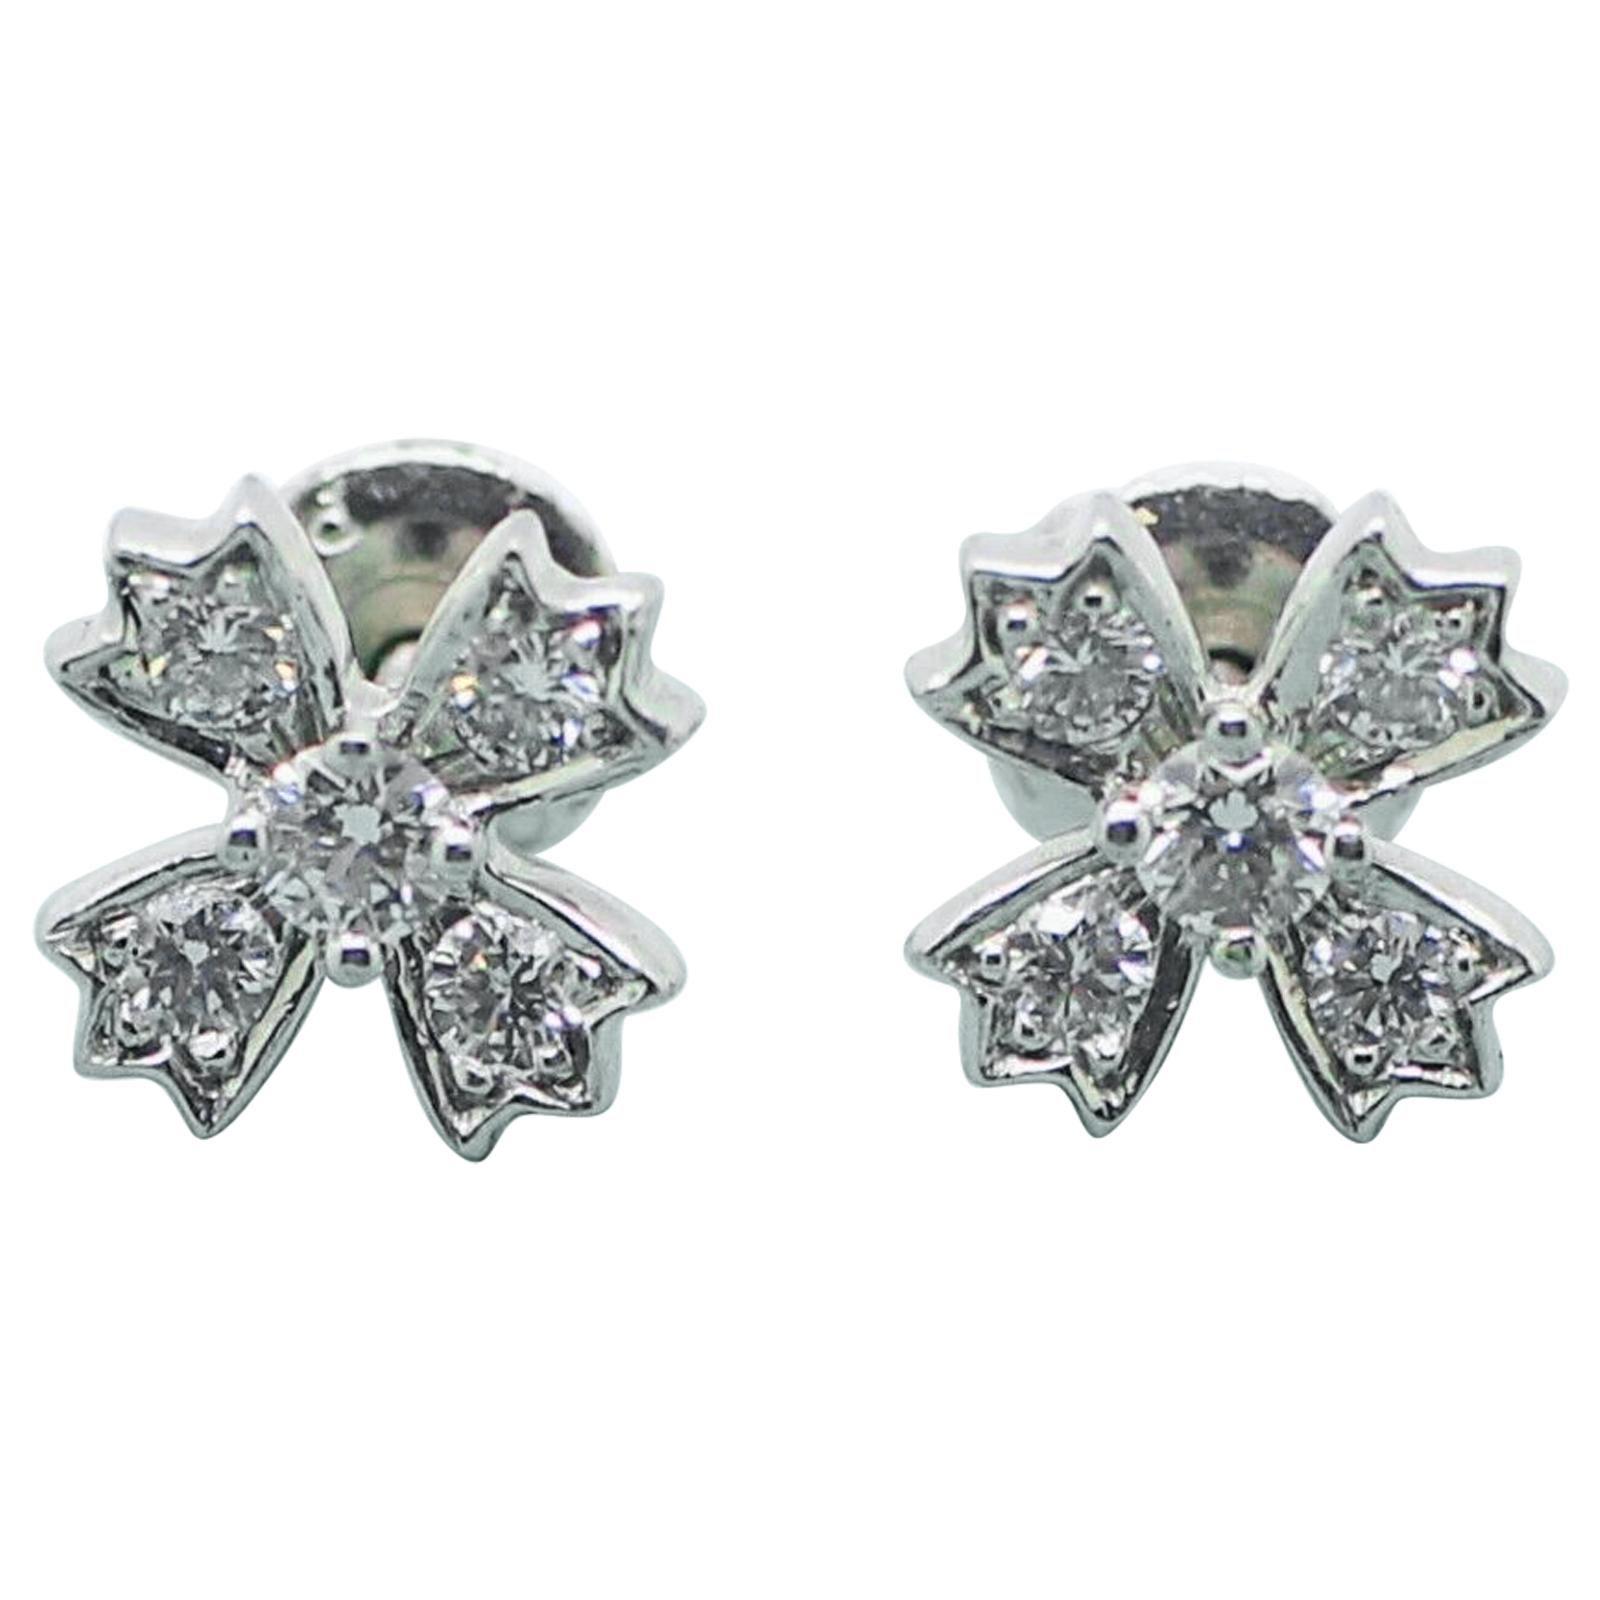 Authentic Tiffany & Co. Floret Stud Earrings of Round Brilliant Diamonds